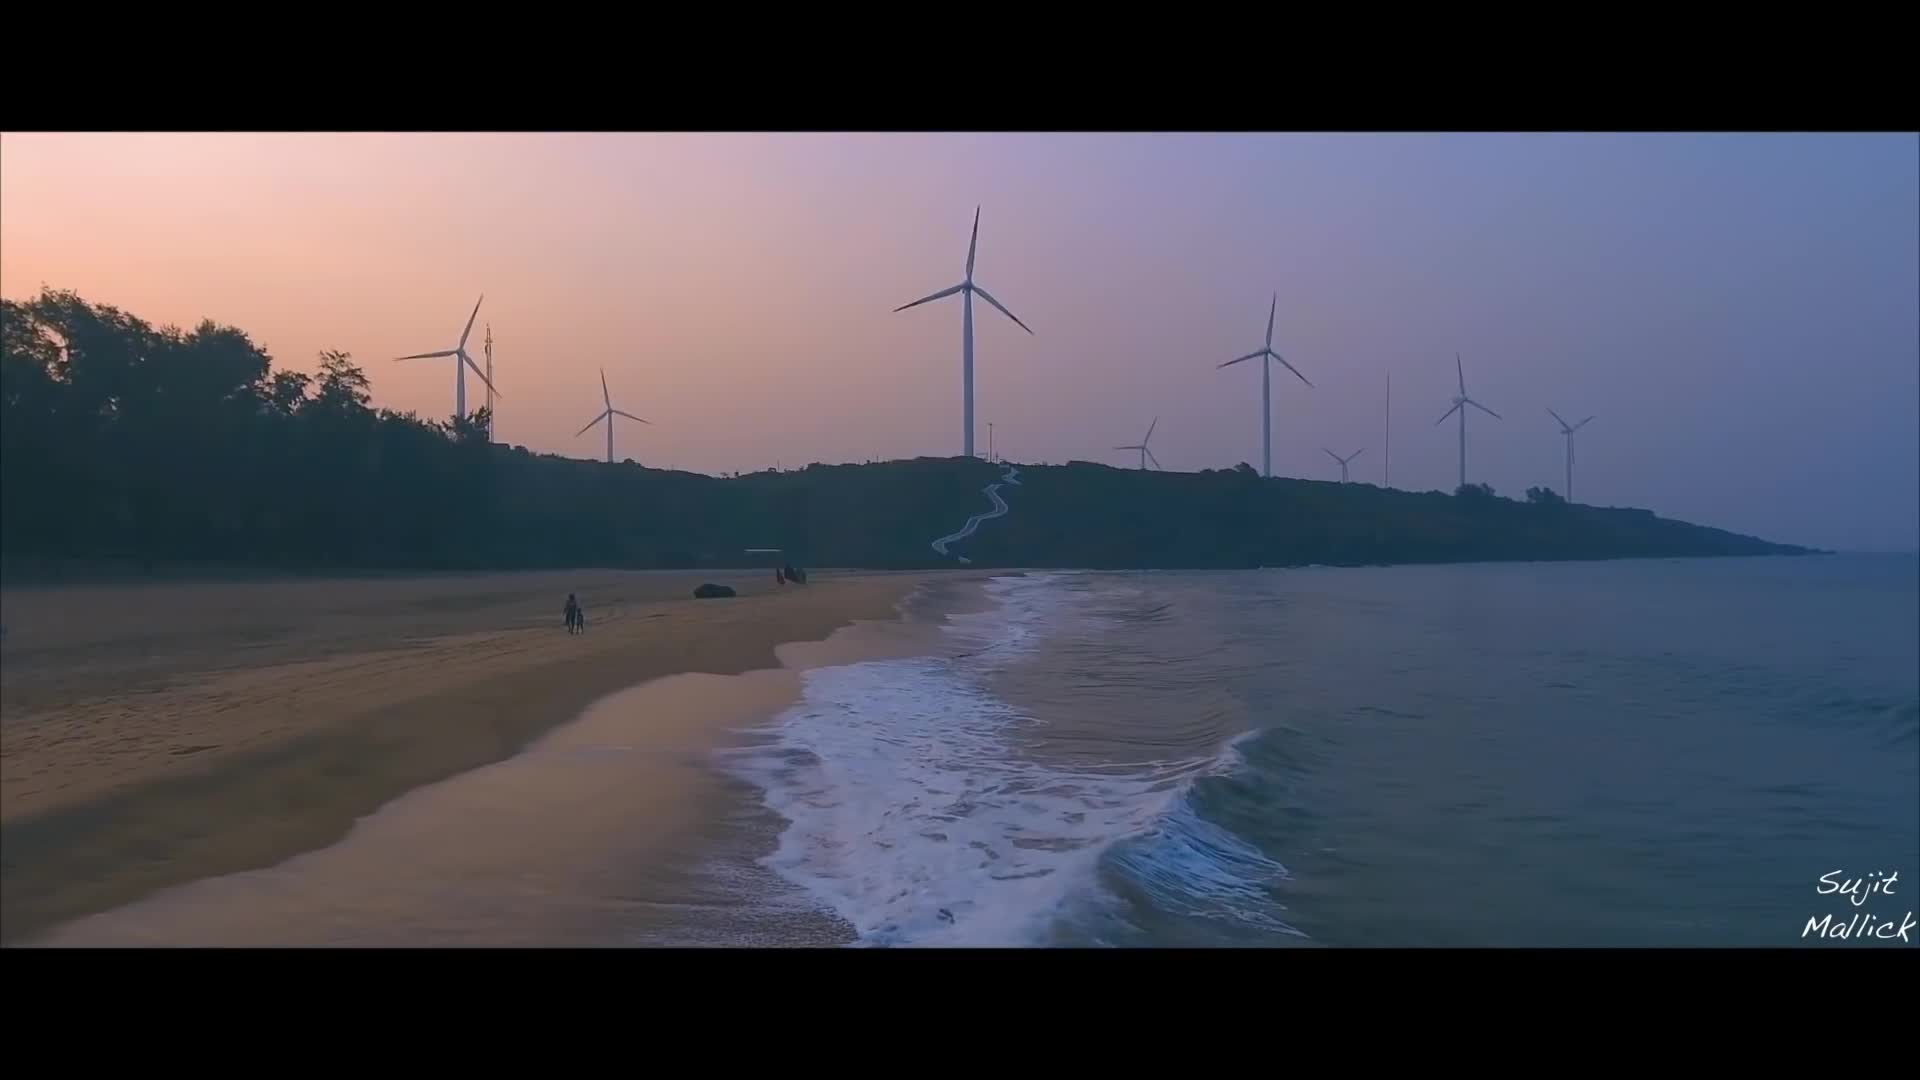 Djiphantom, Konkan Coast, beautiful, dji, droneshots, konkan, mavic, mavic air, mavic pro, phantom, Devgad Ocean GIFs